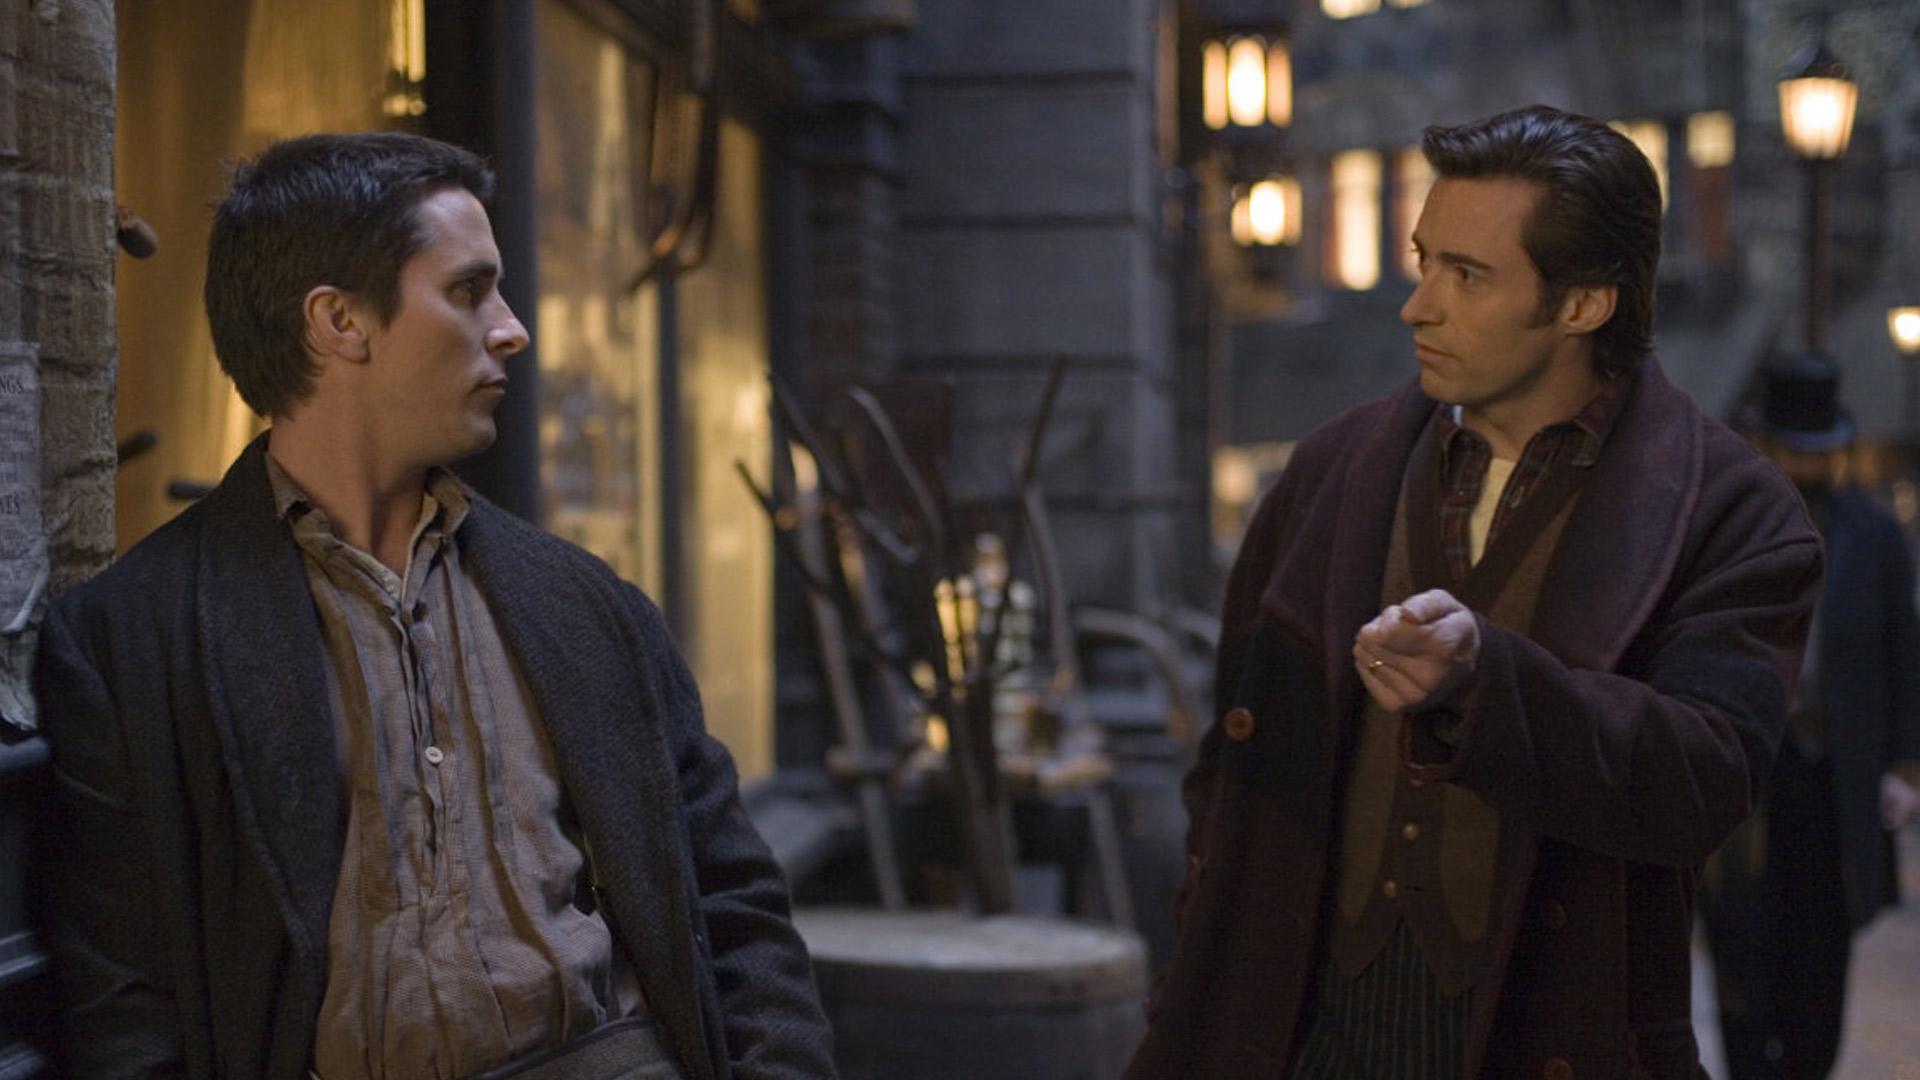 The Prestige 4 - نقد فیلم The Prestige (پرستیژ) | دیالکتیک سقوط